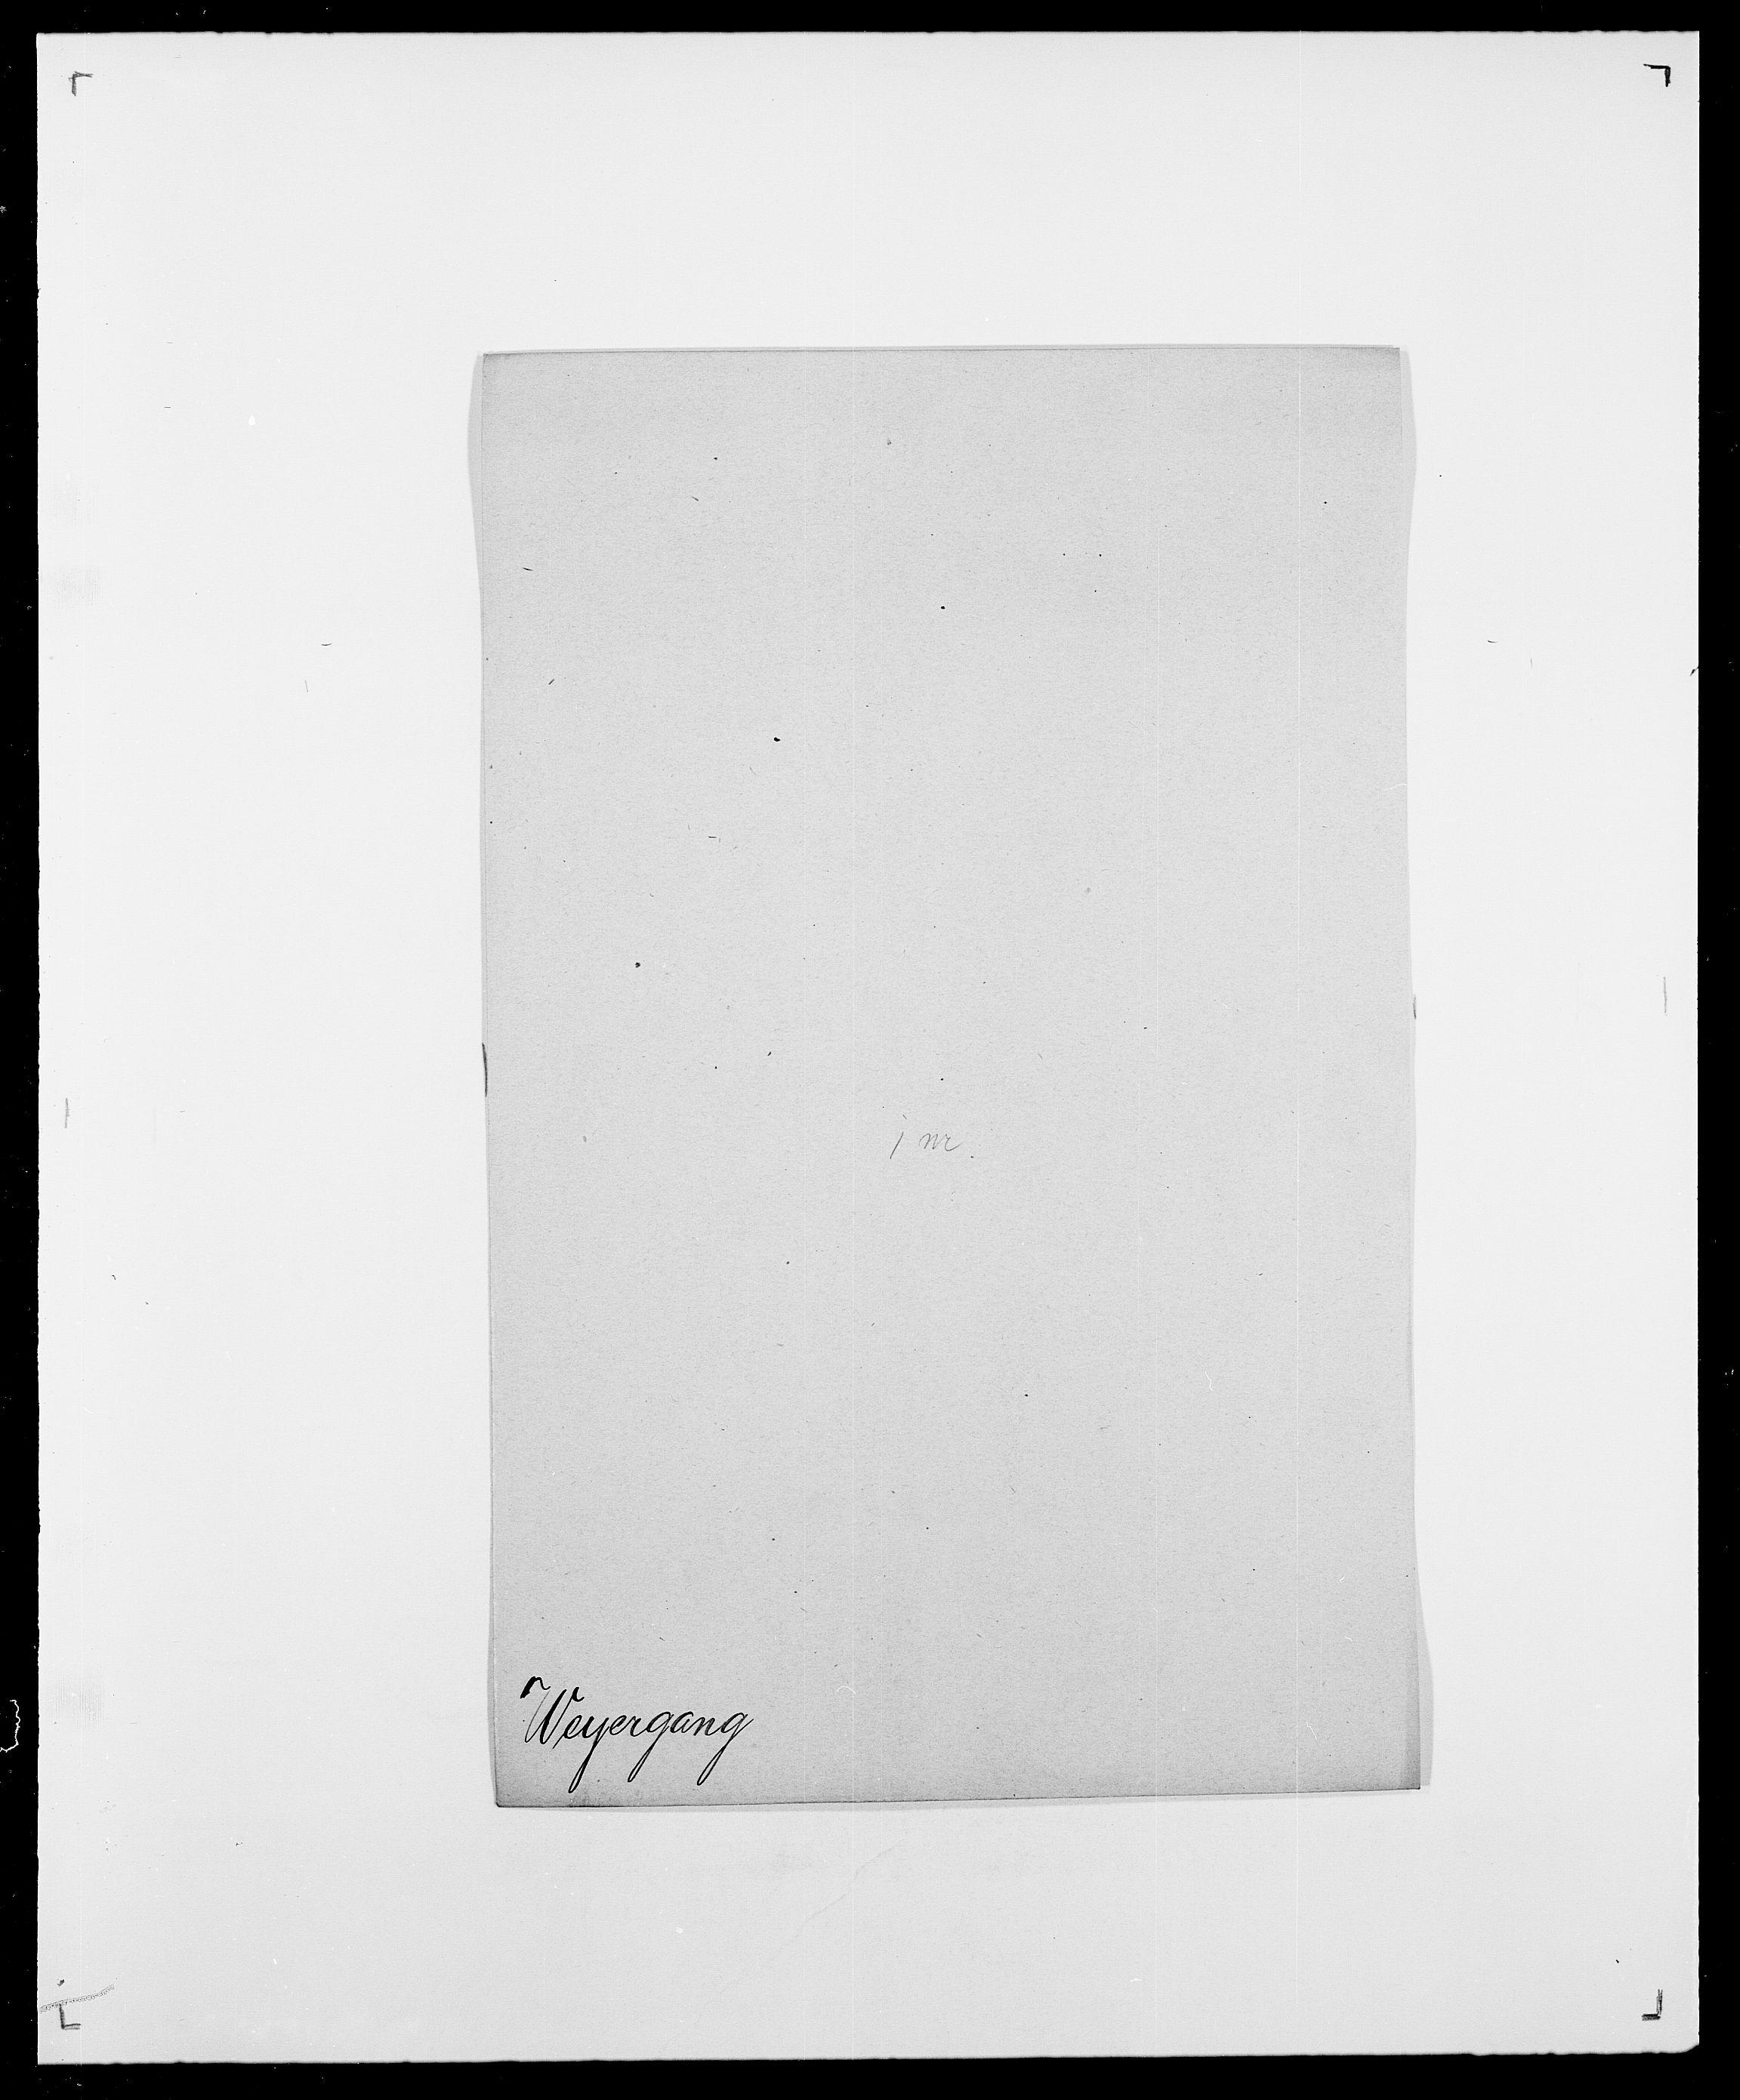 SAO, Delgobe, Charles Antoine - samling, D/Da/L0041: Vemmestad - Viker, s. 366